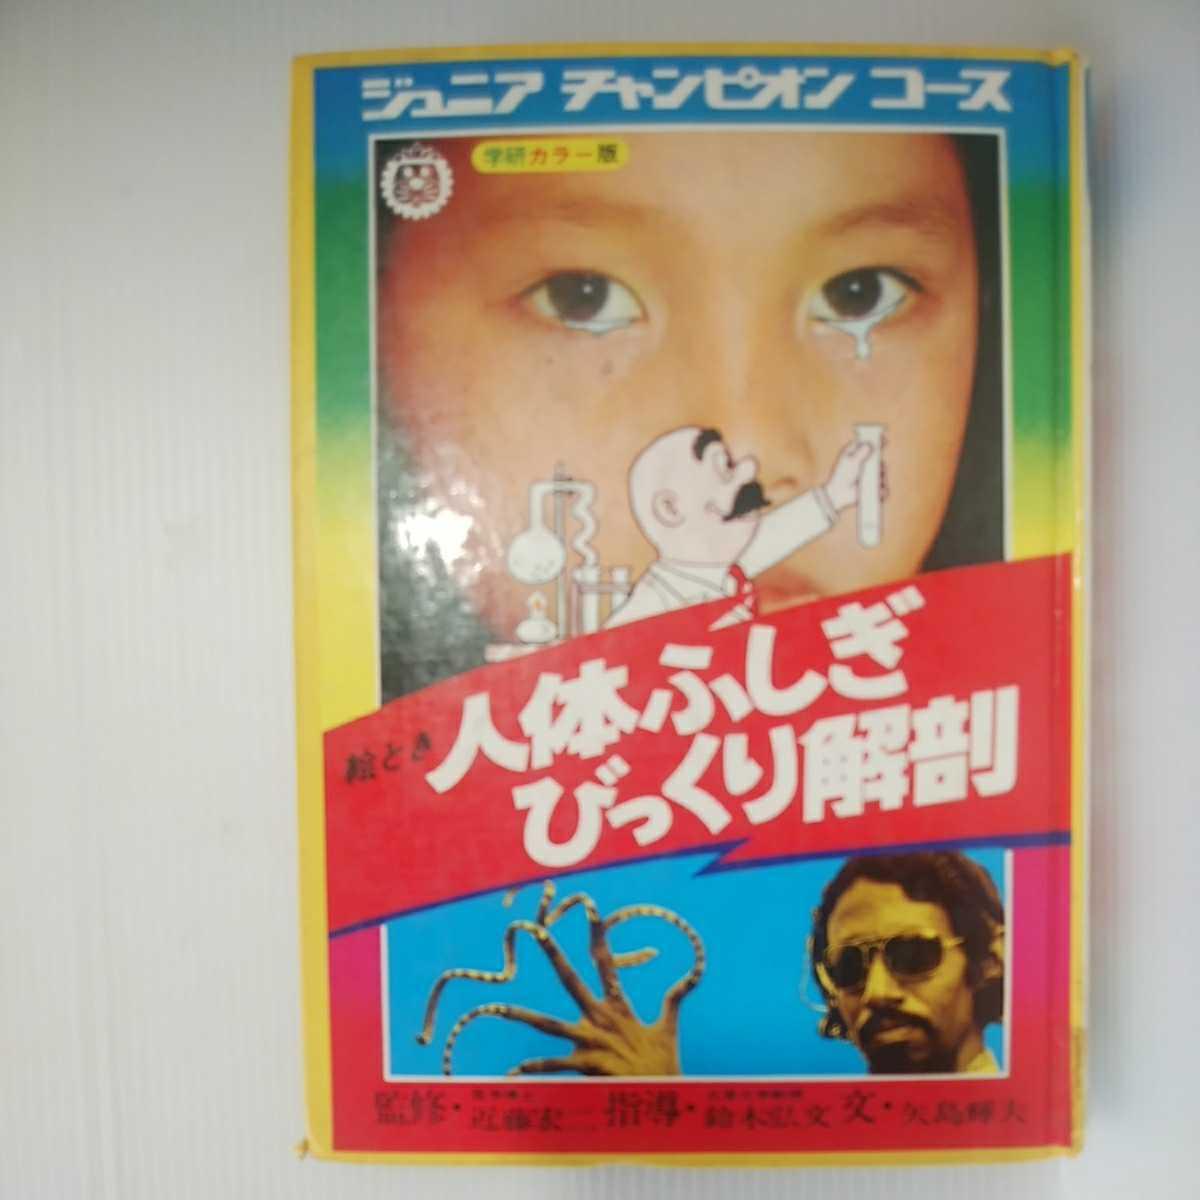 zaa-043♪ 人体ふしぎびっくり解剖 ジュニアチャンピオンコース ―絵とき 矢島 輝夫 (著) 学研プラス (1975)サイン入り